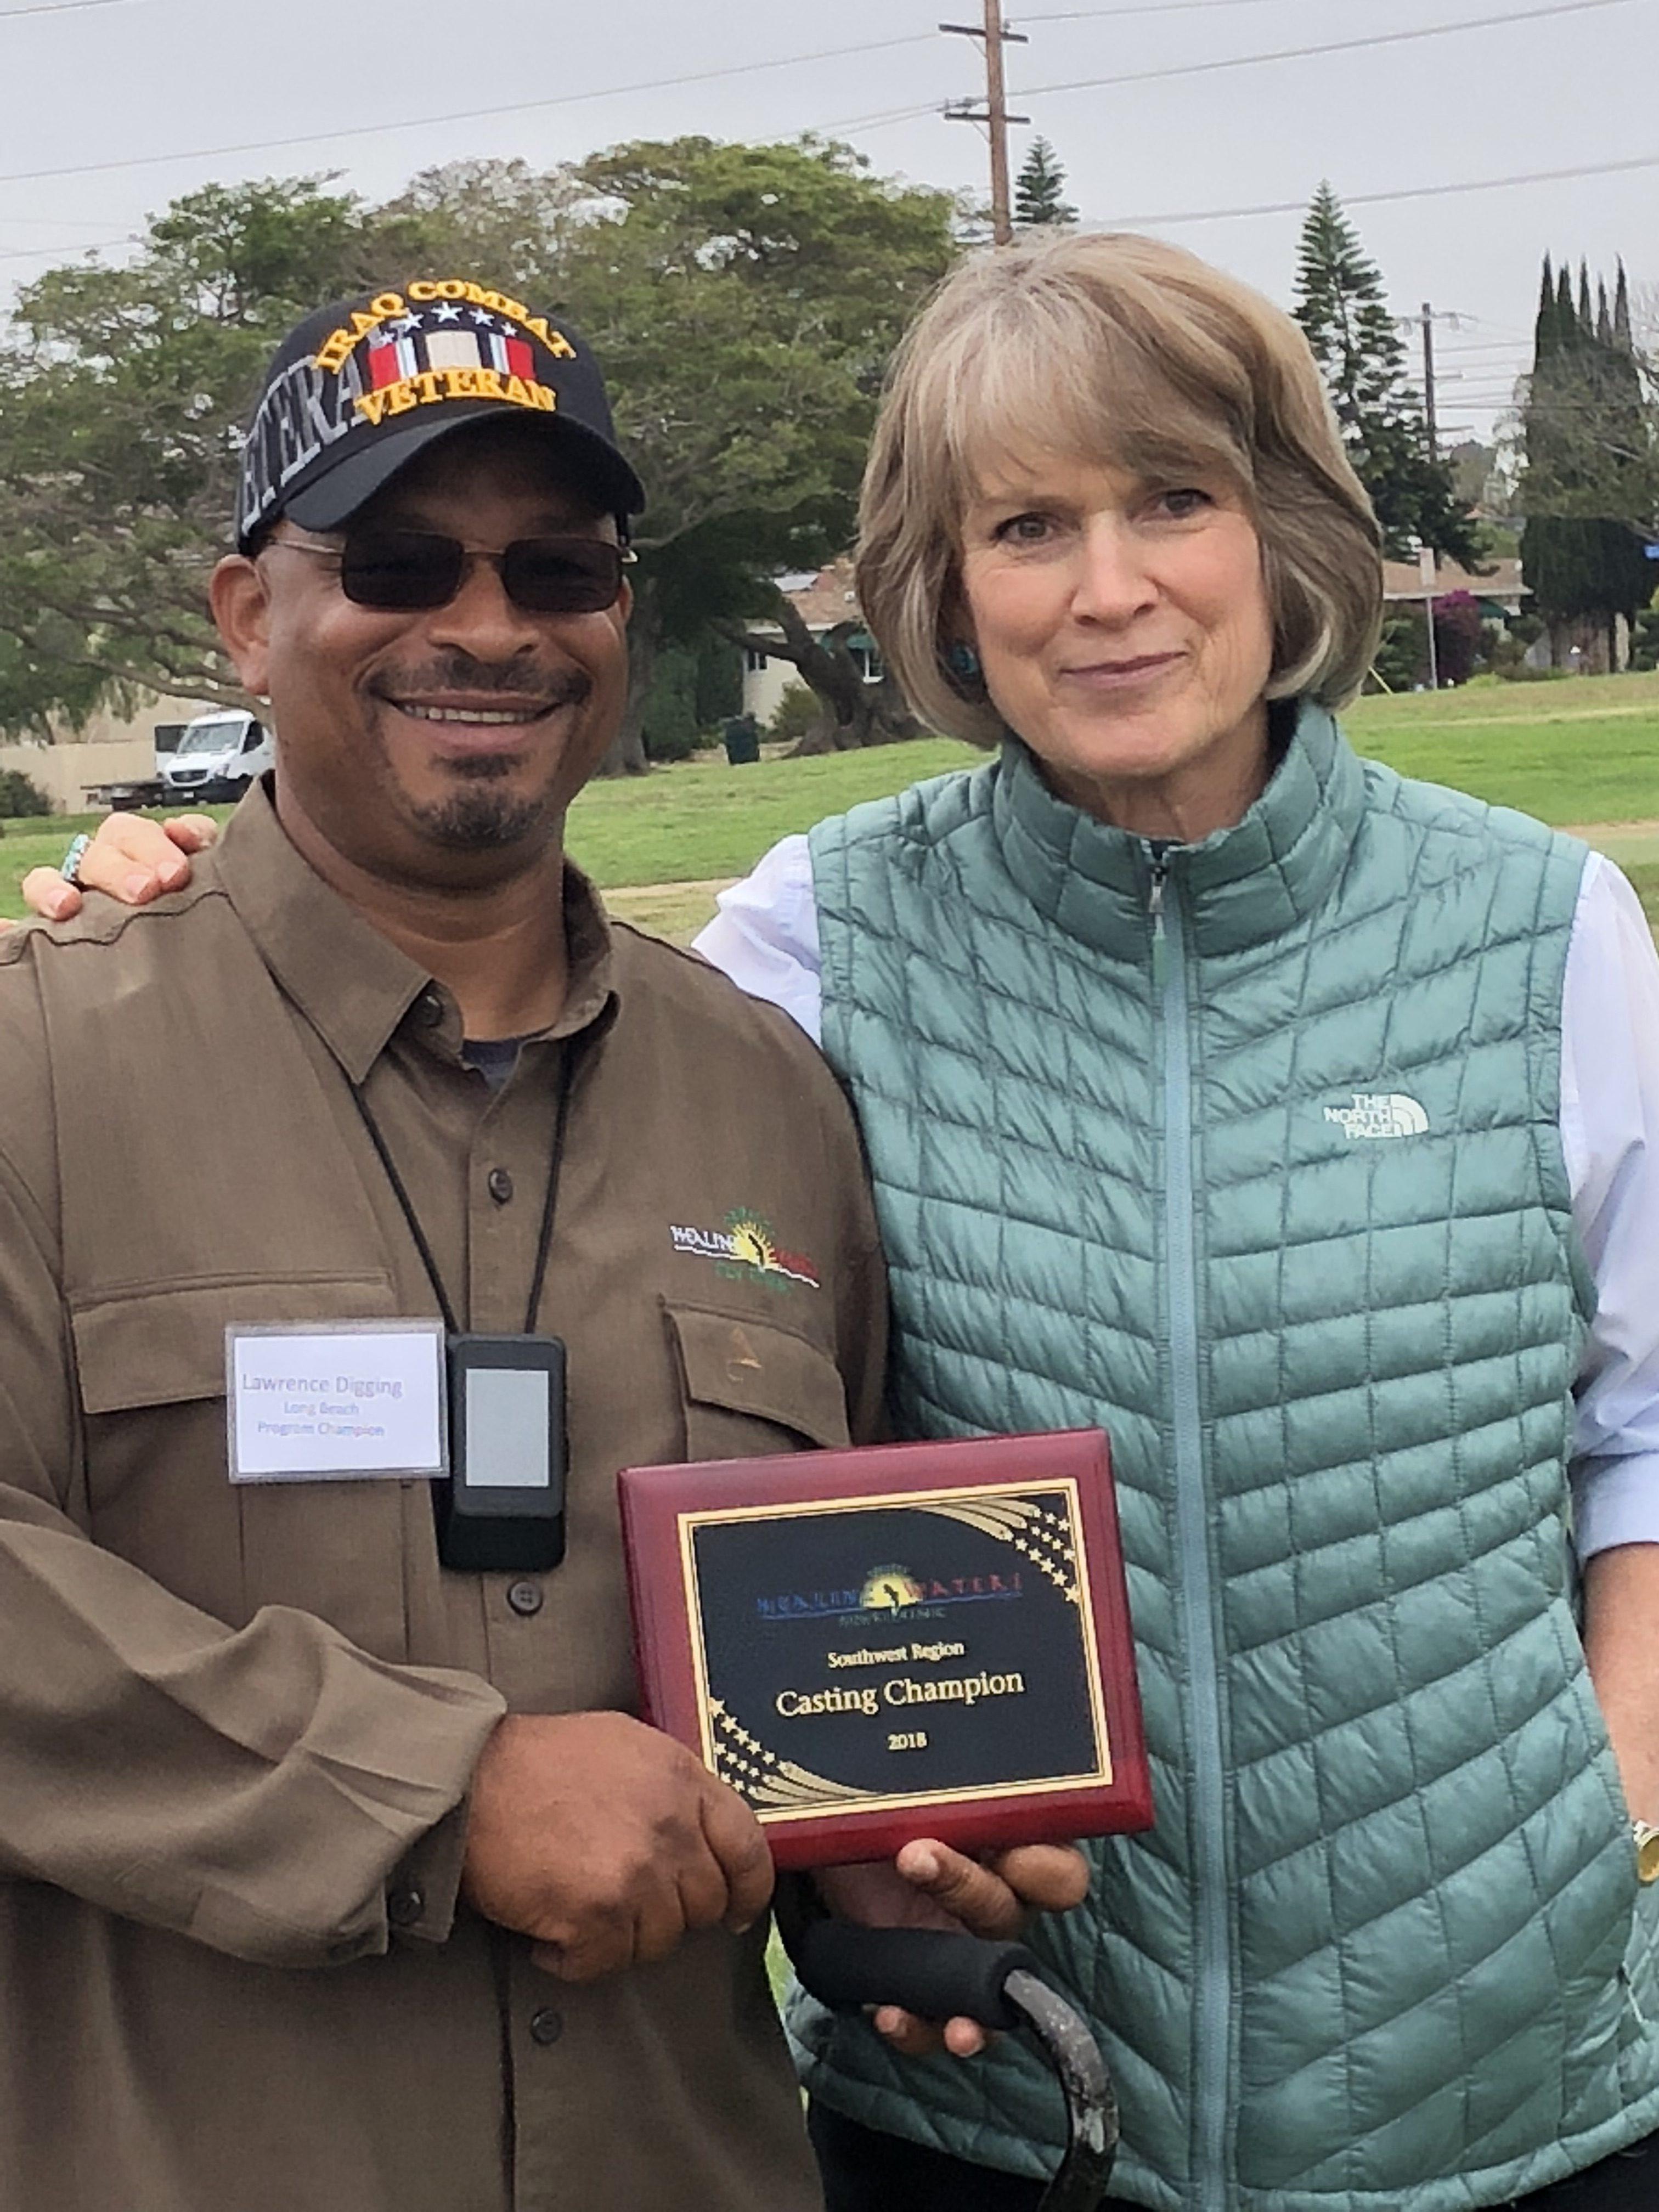 Southwest Region Casting Champion Lawrence Digging